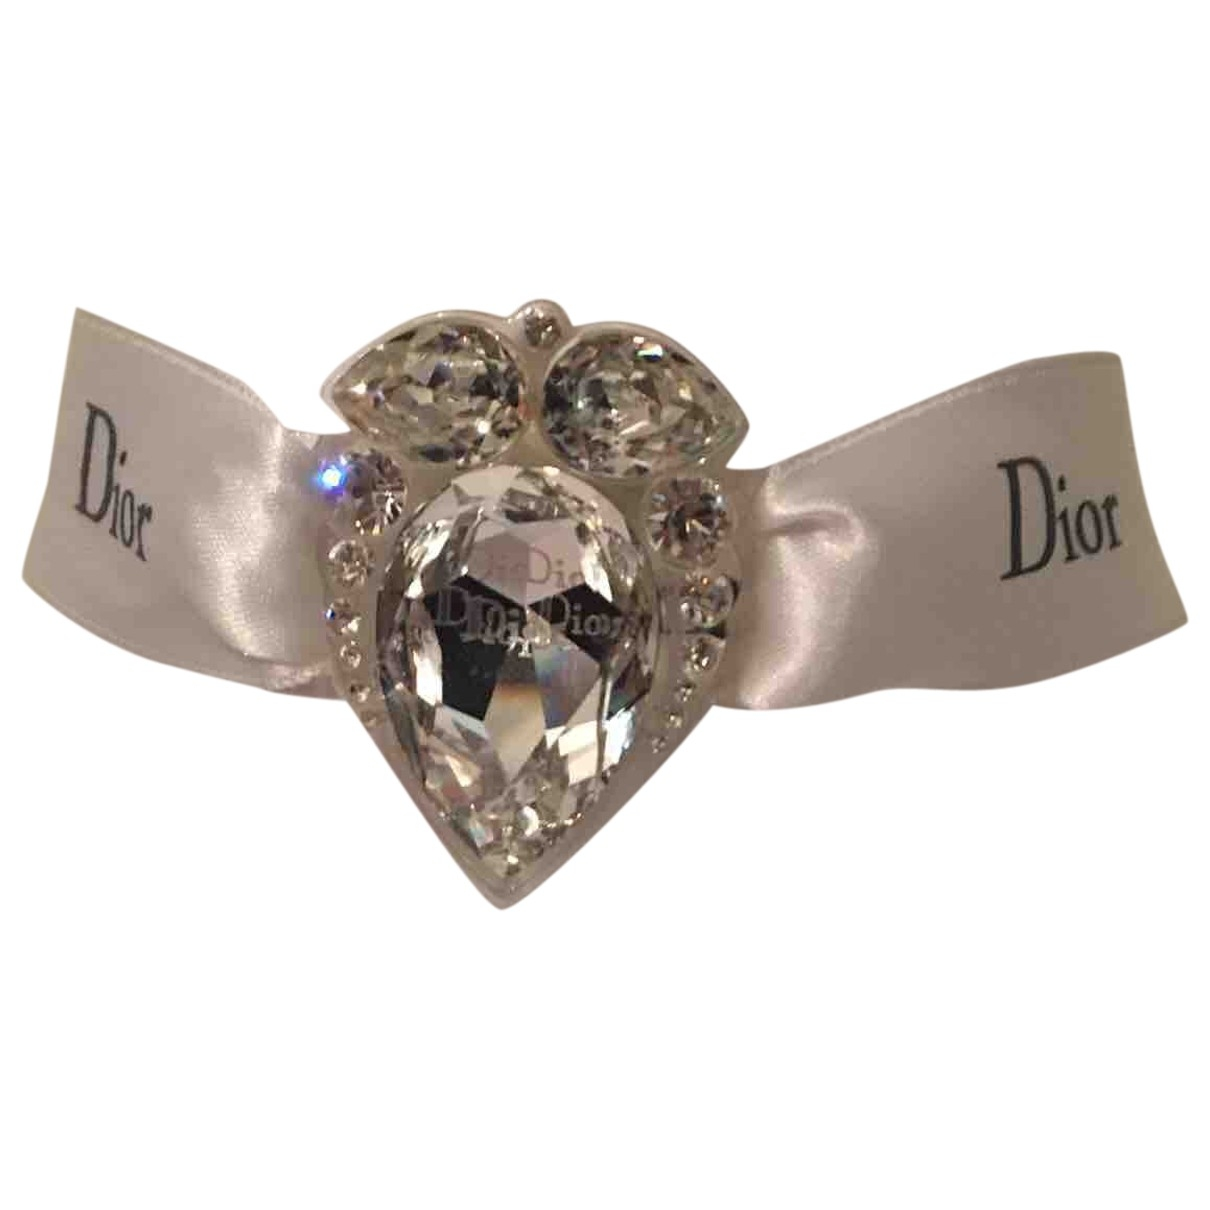 Collar de Cristal Dior